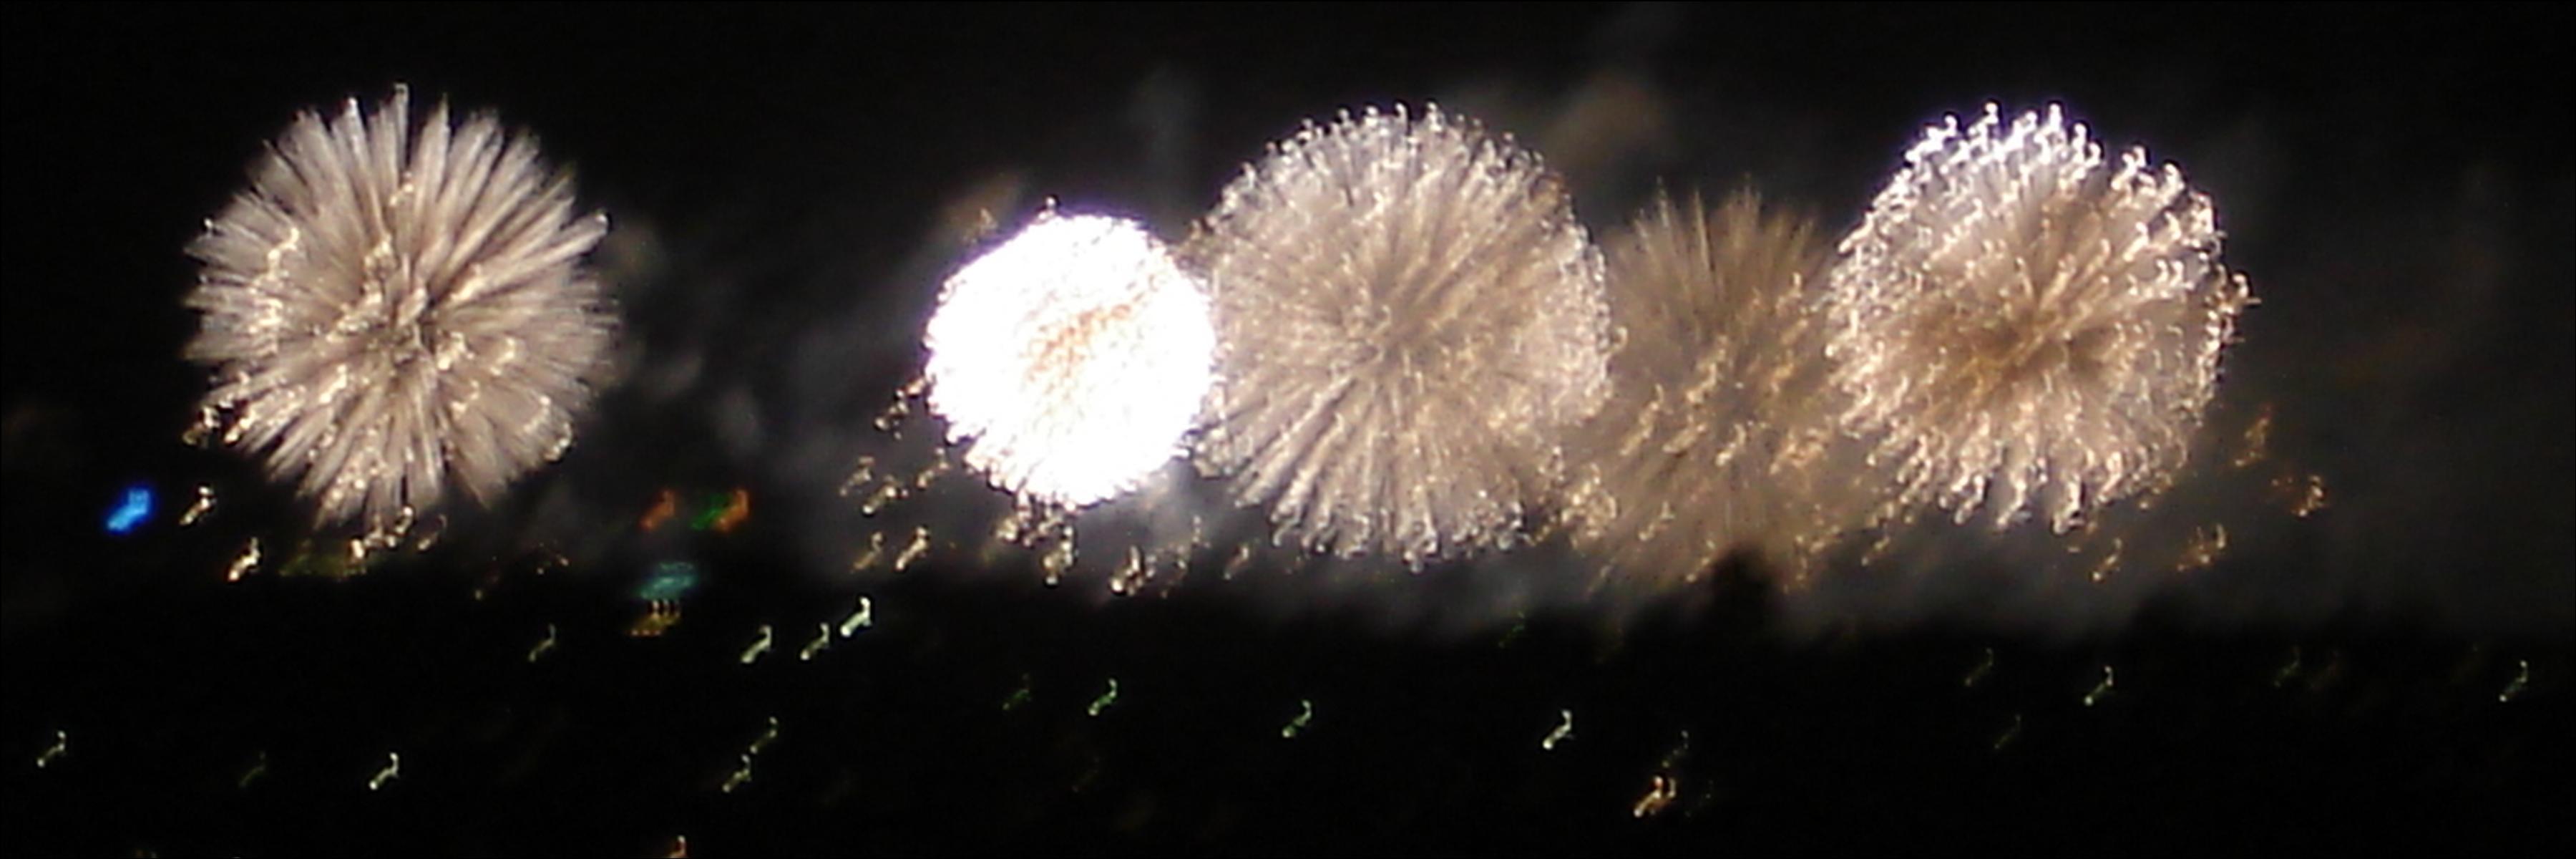 Fireworks1_0.jpg